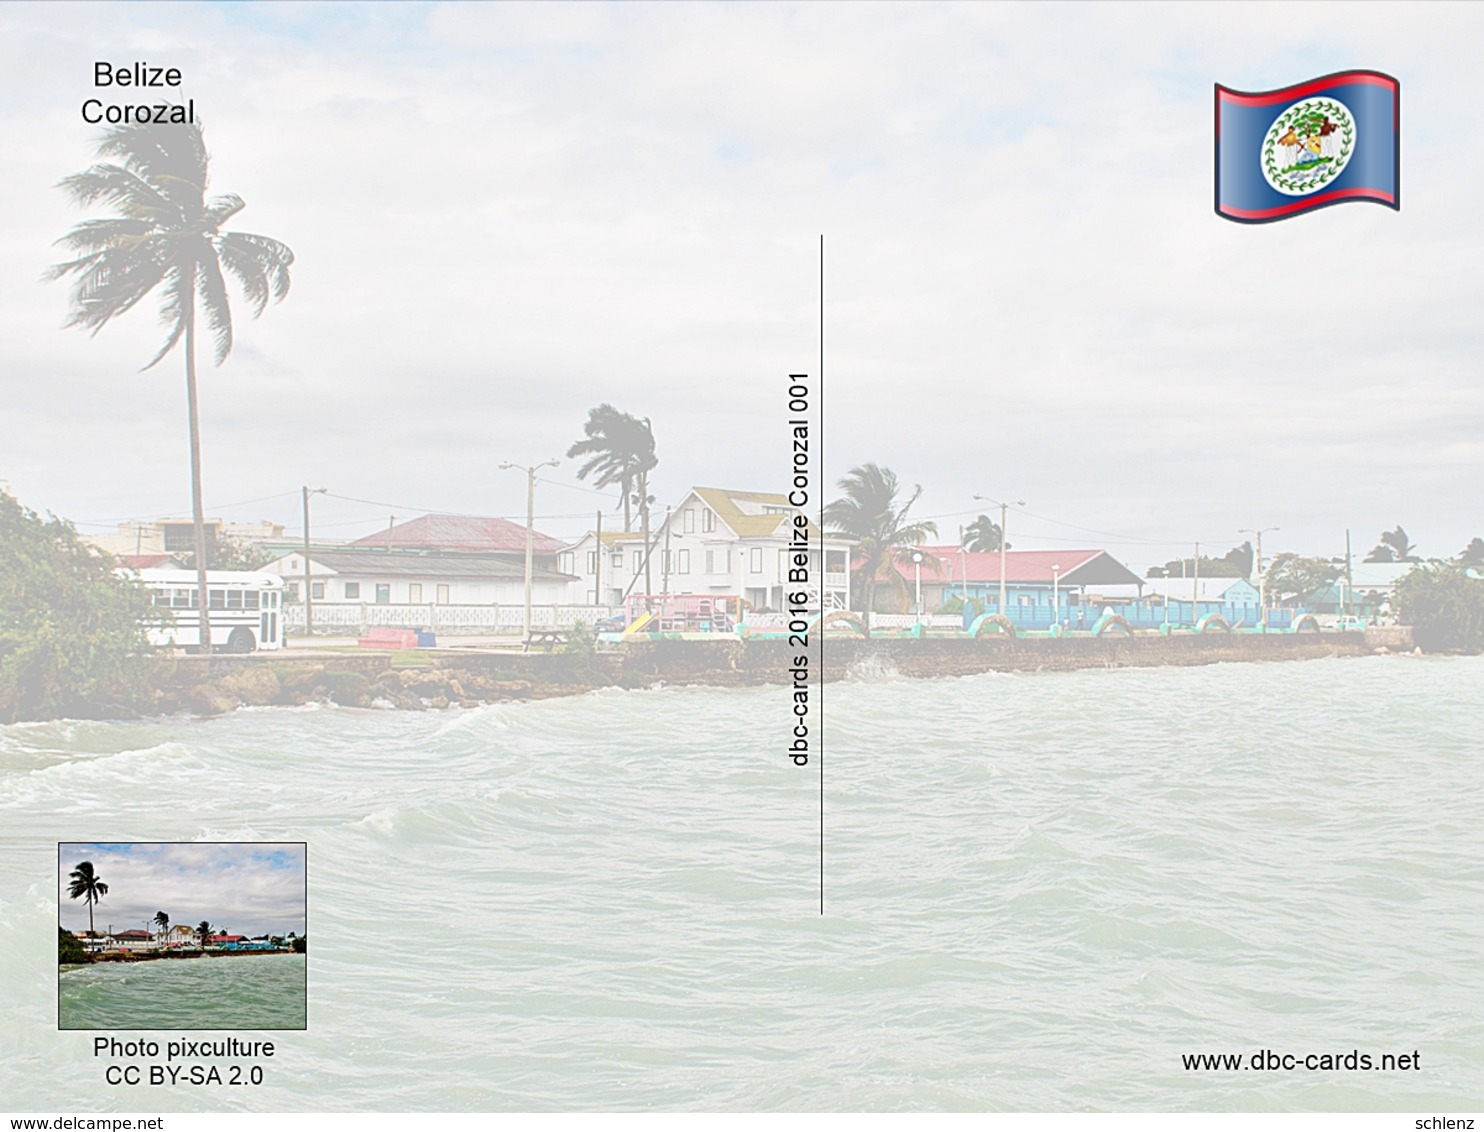 Corozal Belize 1 - Belize